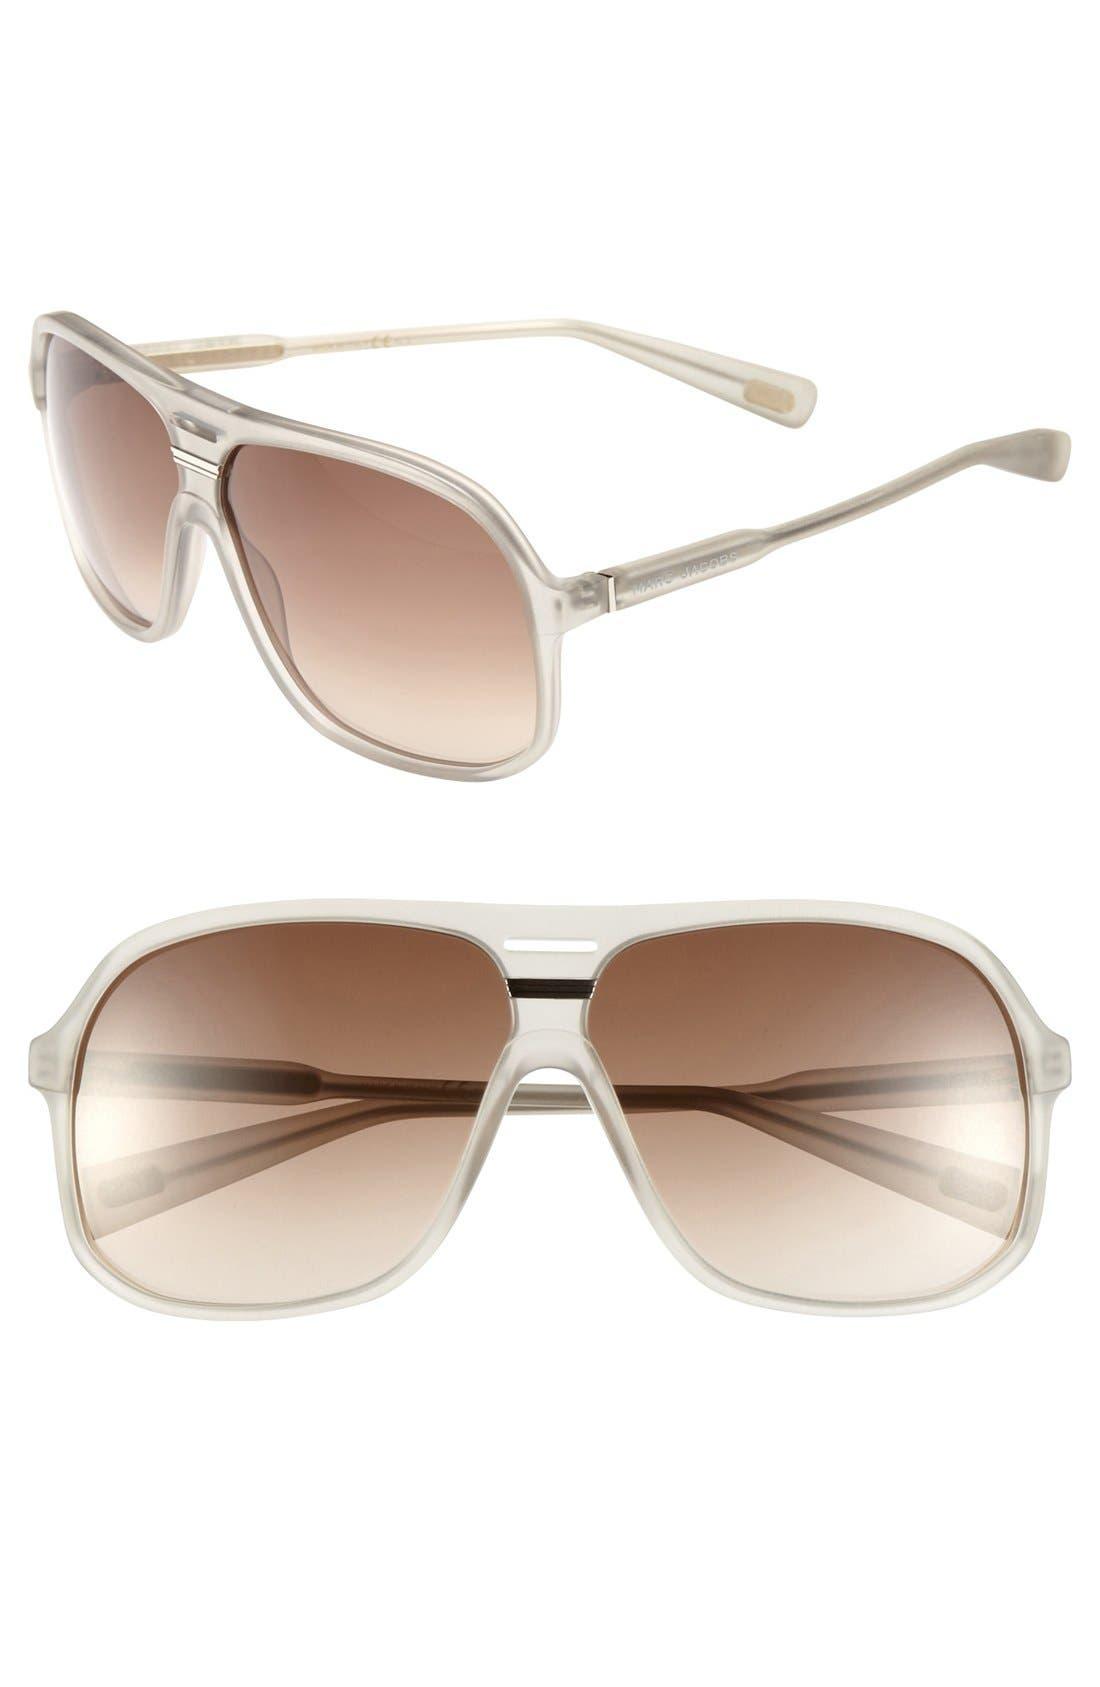 Main Image - MARC JACOBS 63mm Sunglasses